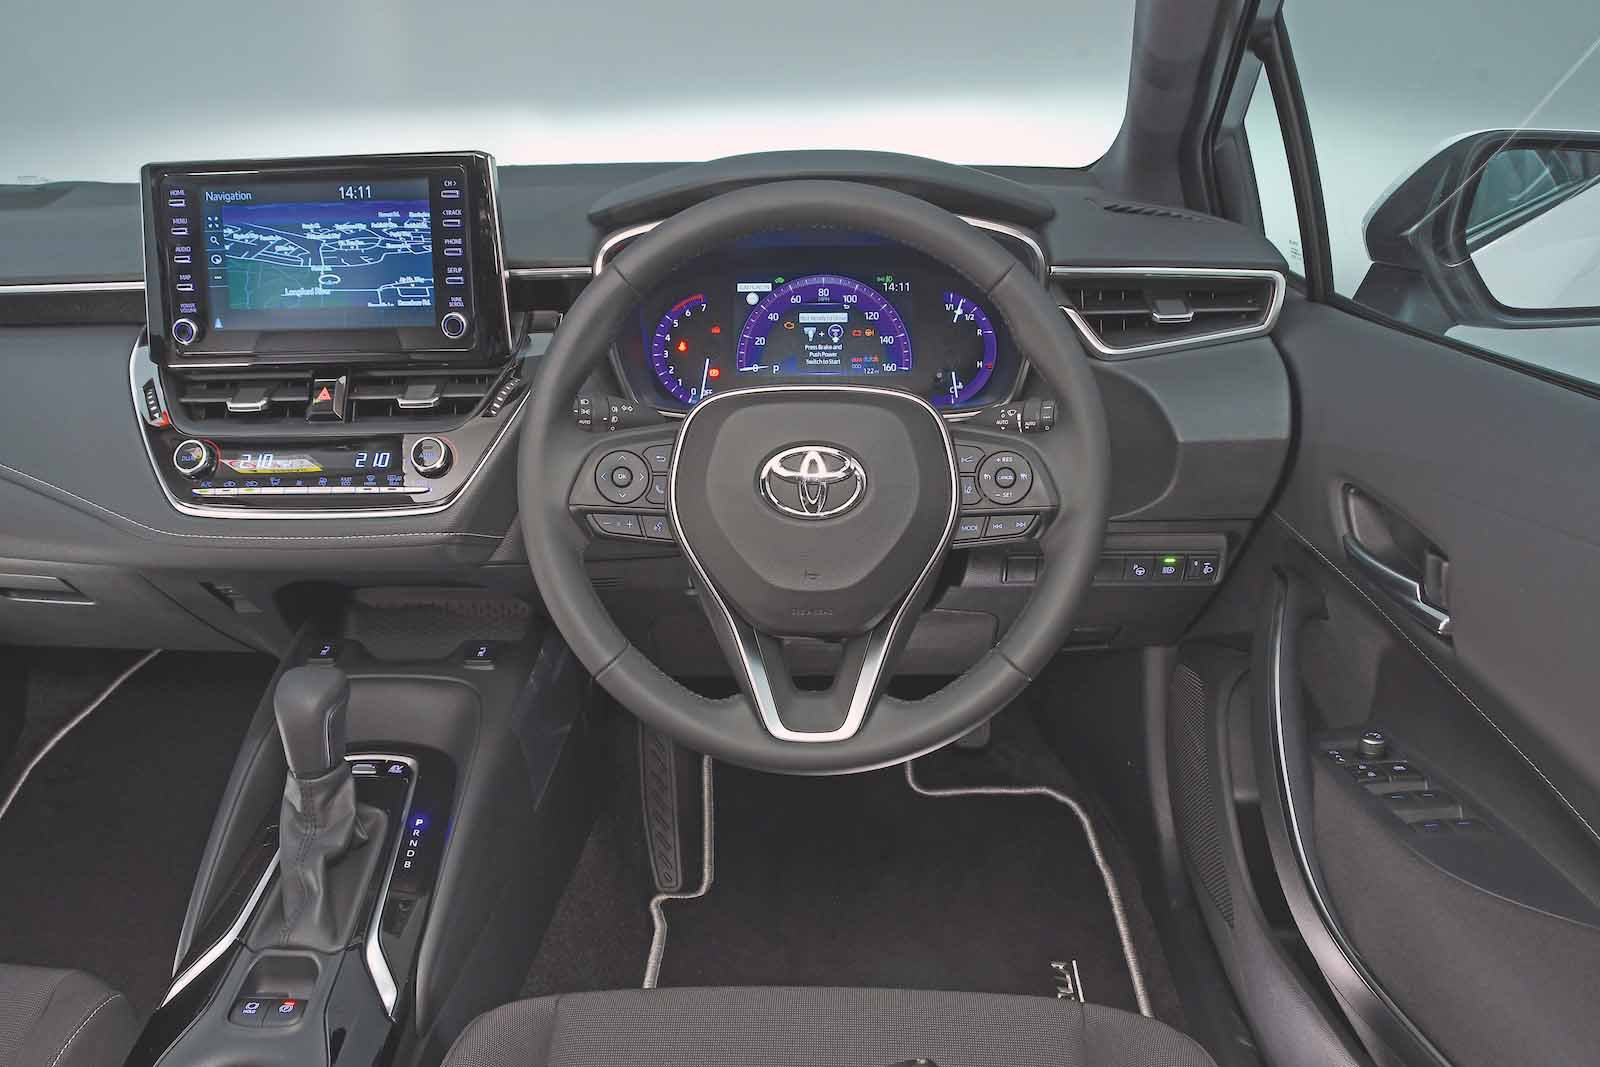 Toyota Corolla 1.8 Hybrid Icon CVT - interior